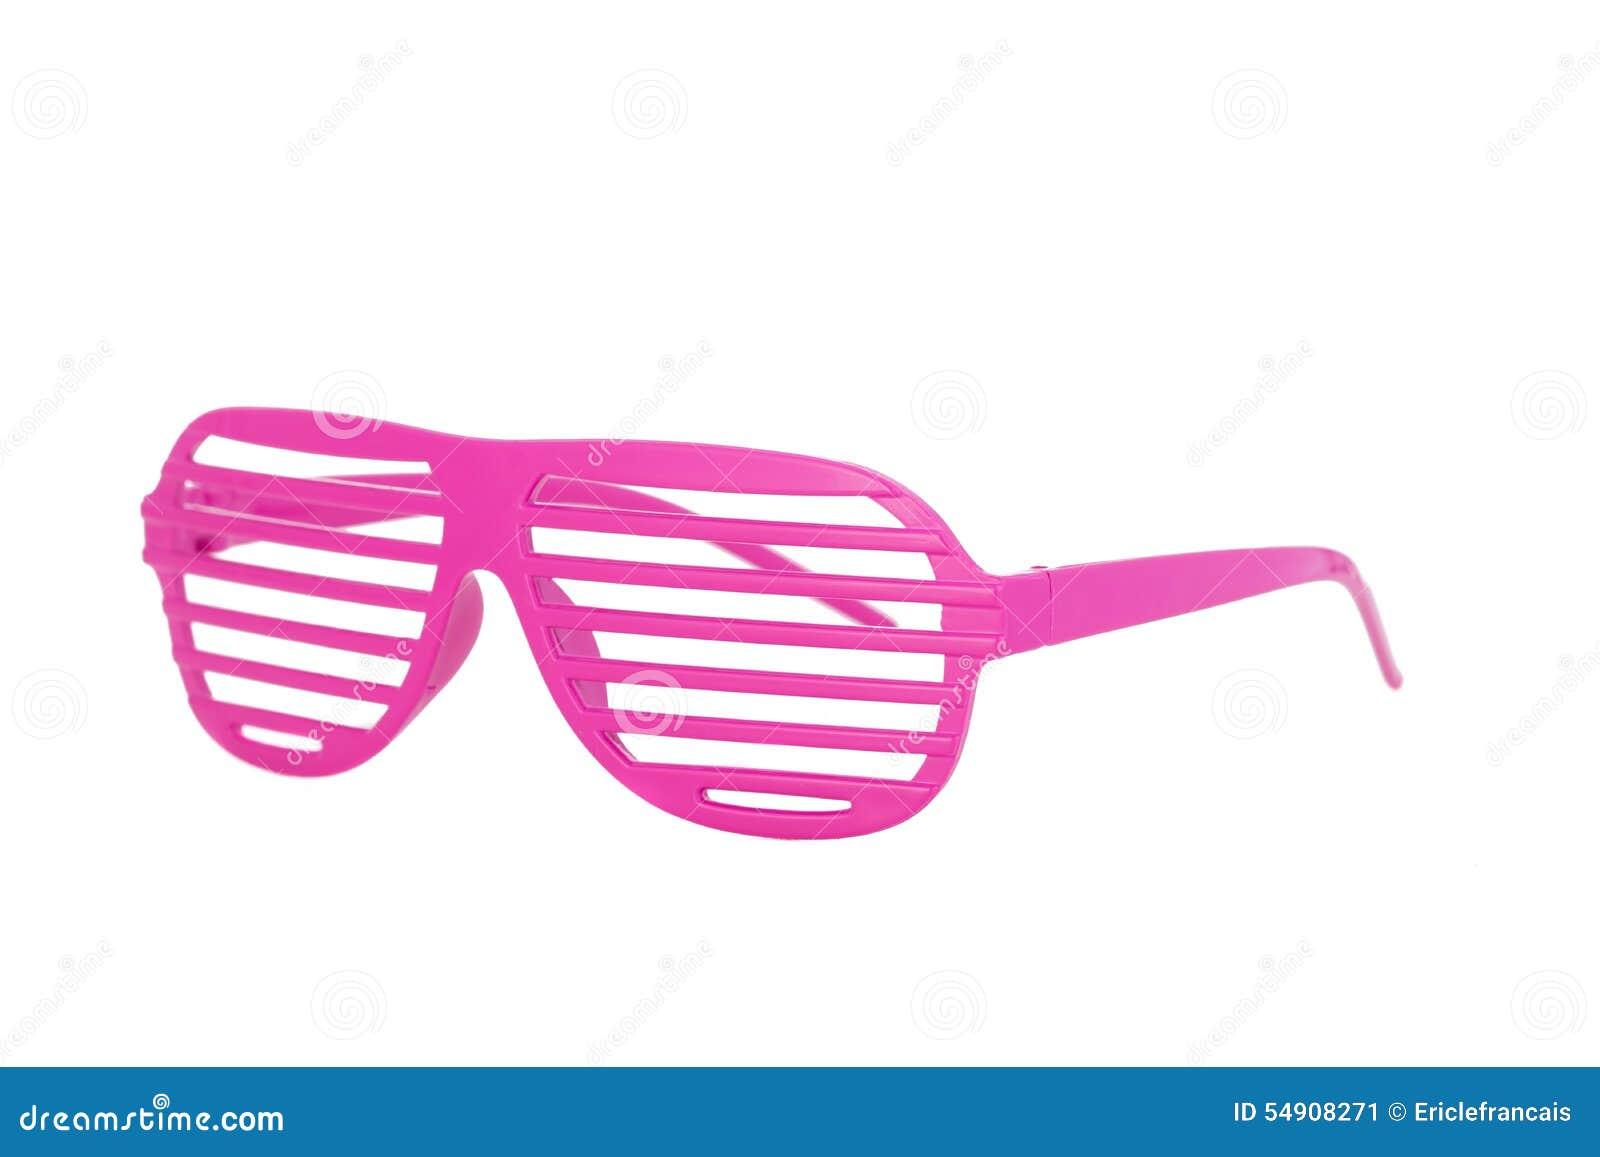 Free 80'S Sunglasses Cliparts, Download Free Clip Art, Free Clip Art on  Clipart Library